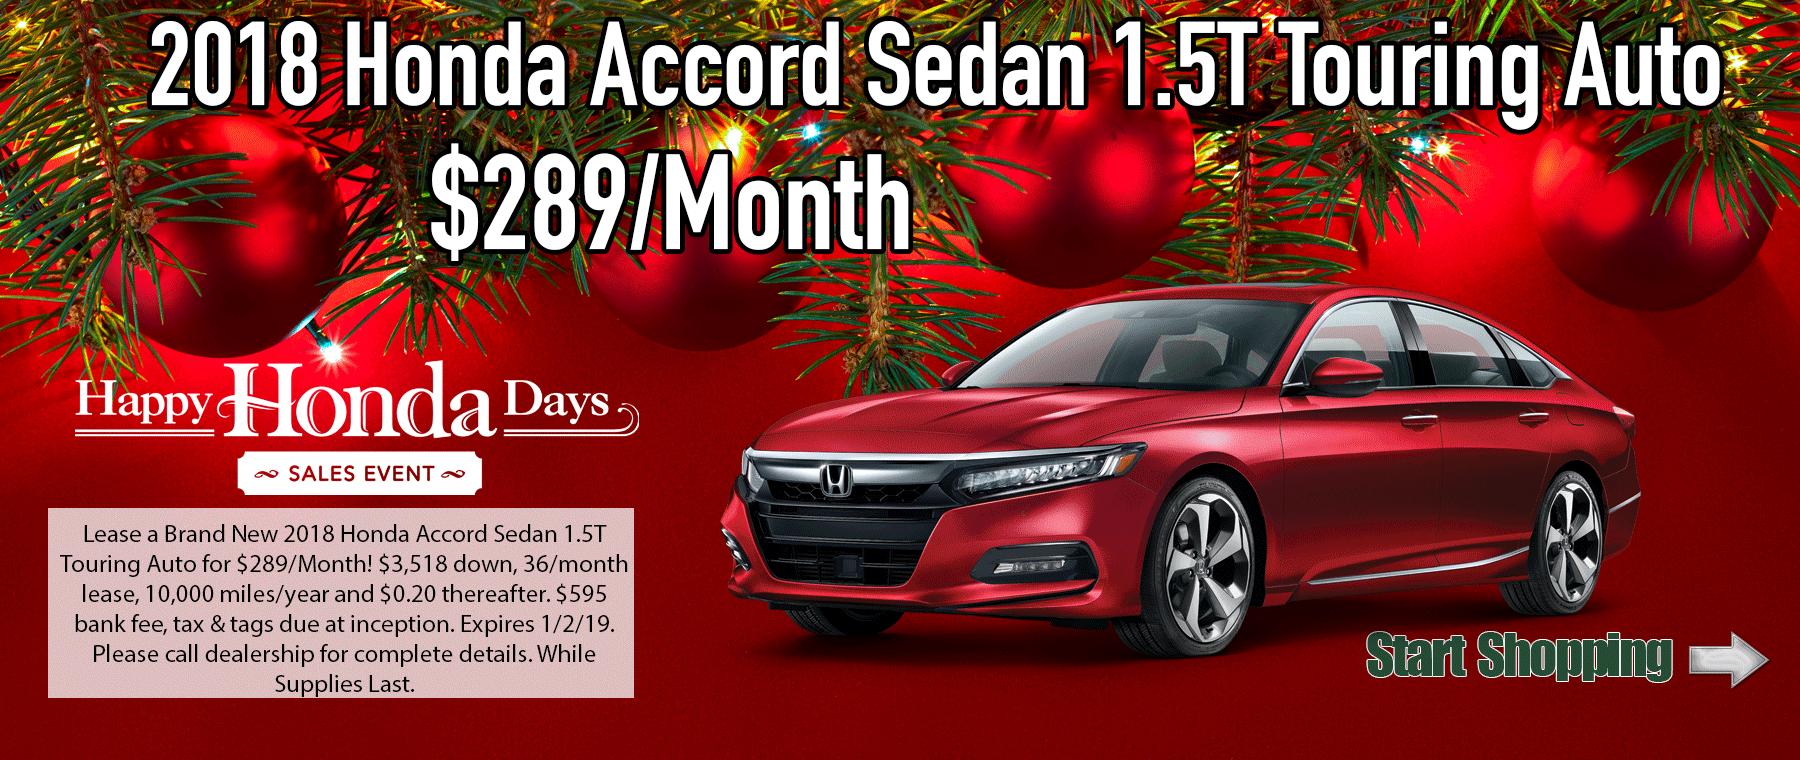 Honda Accord 1.5T Touring Auto